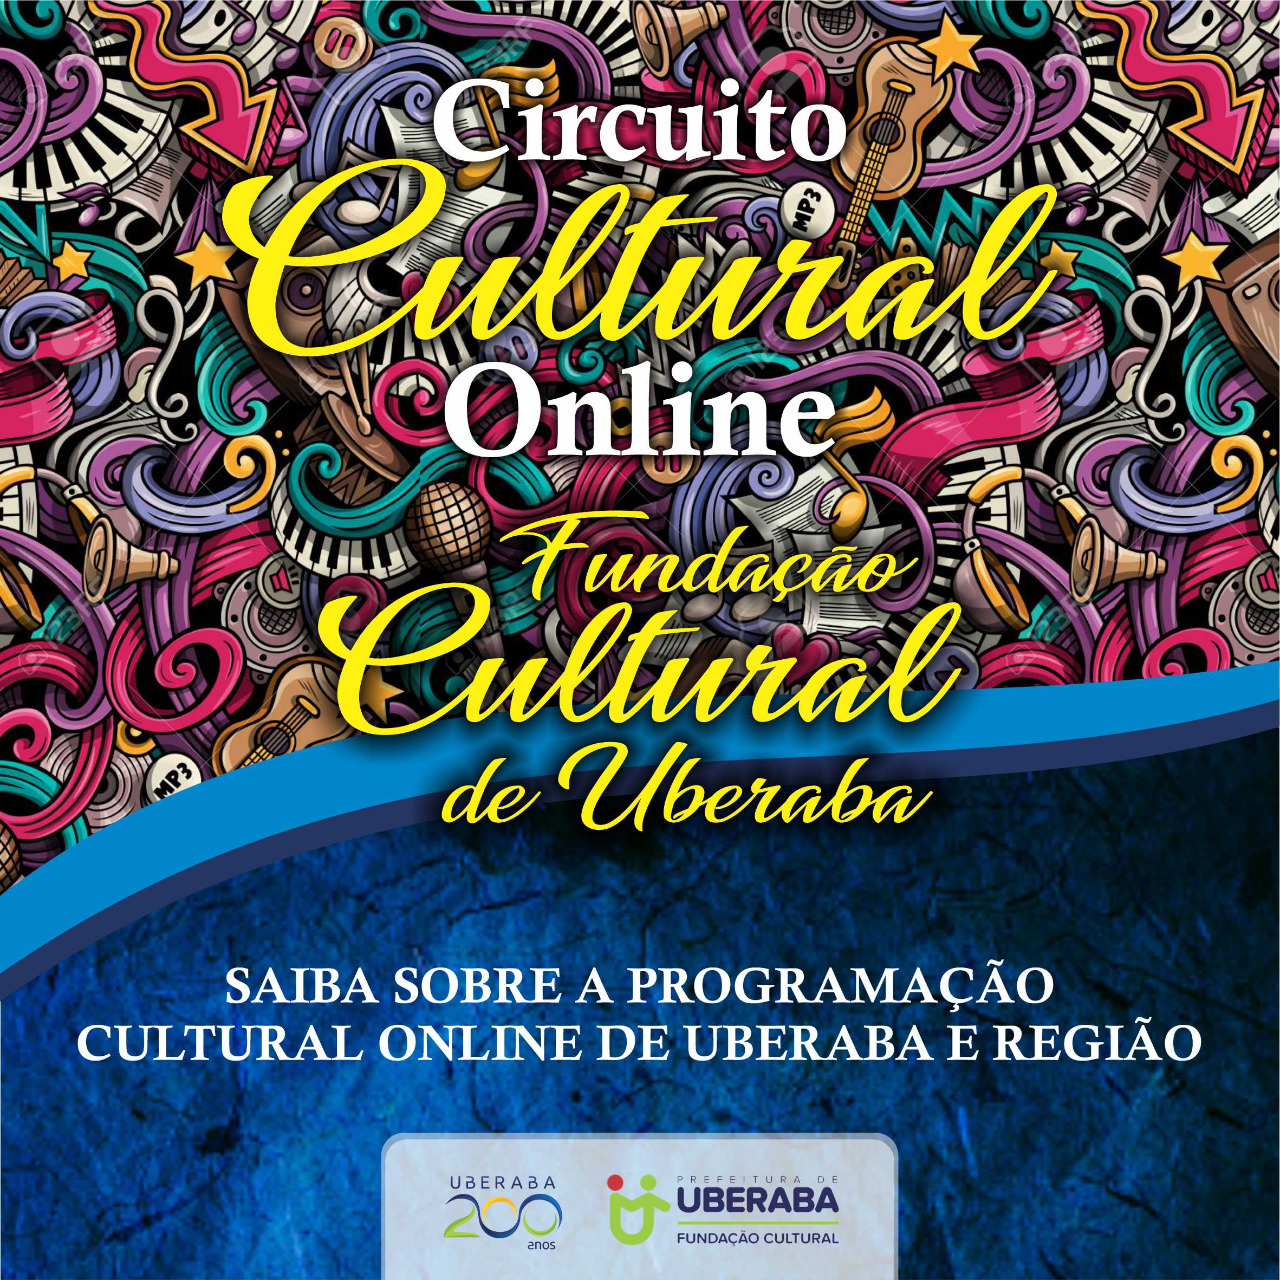 Circuito Cultural On-line Fundação Cultural de Uberaba